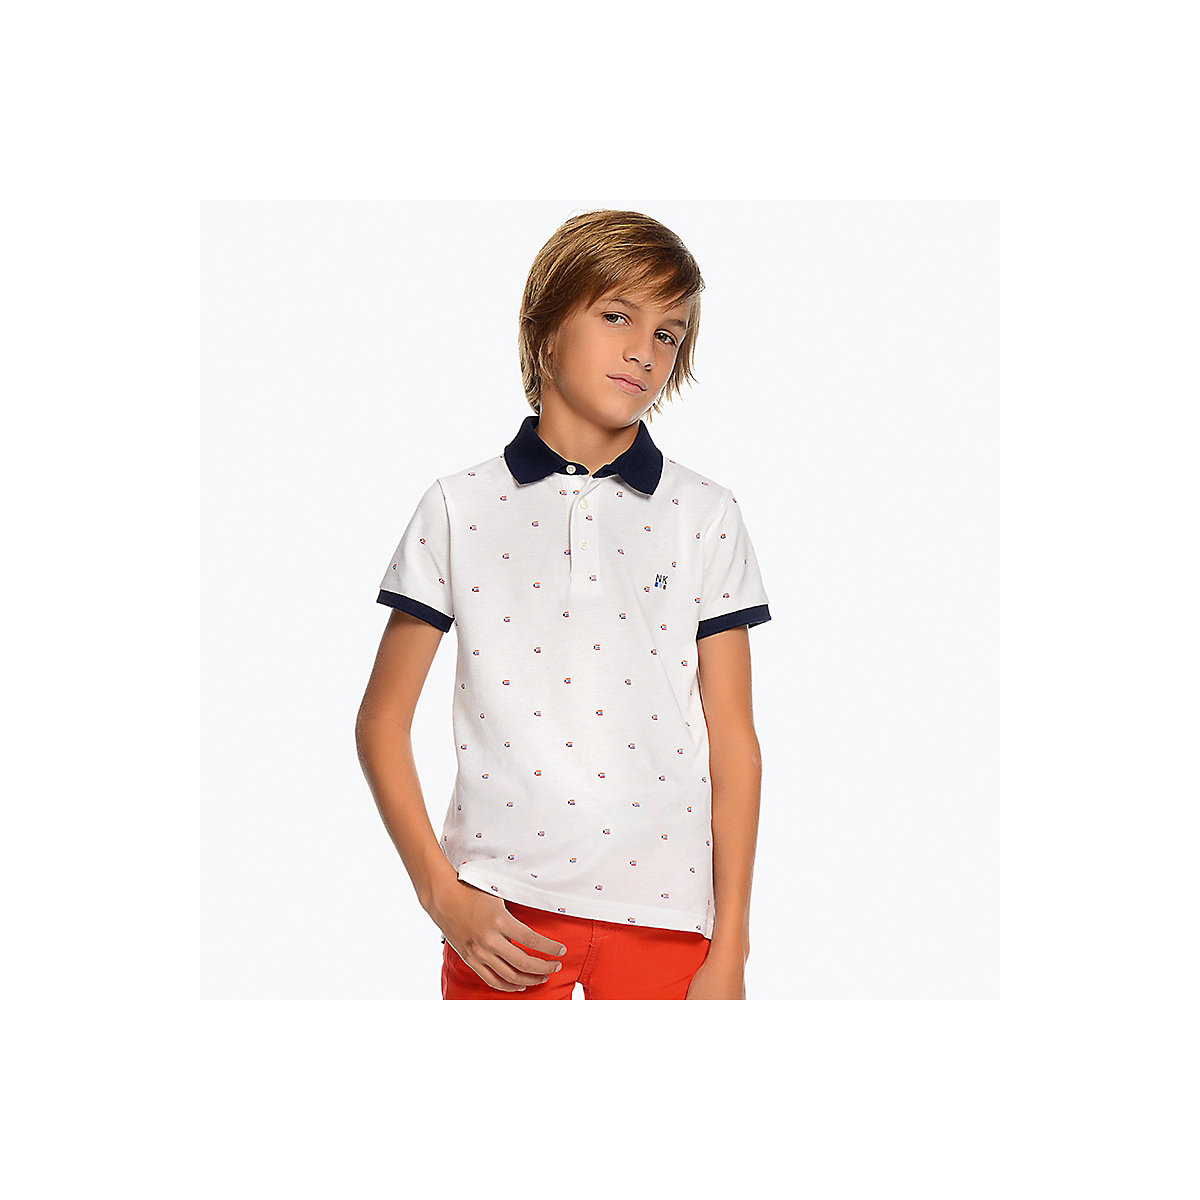 MAYORAL Polo Shirts 10687198 children clothing t-shirt shirt the print for boys